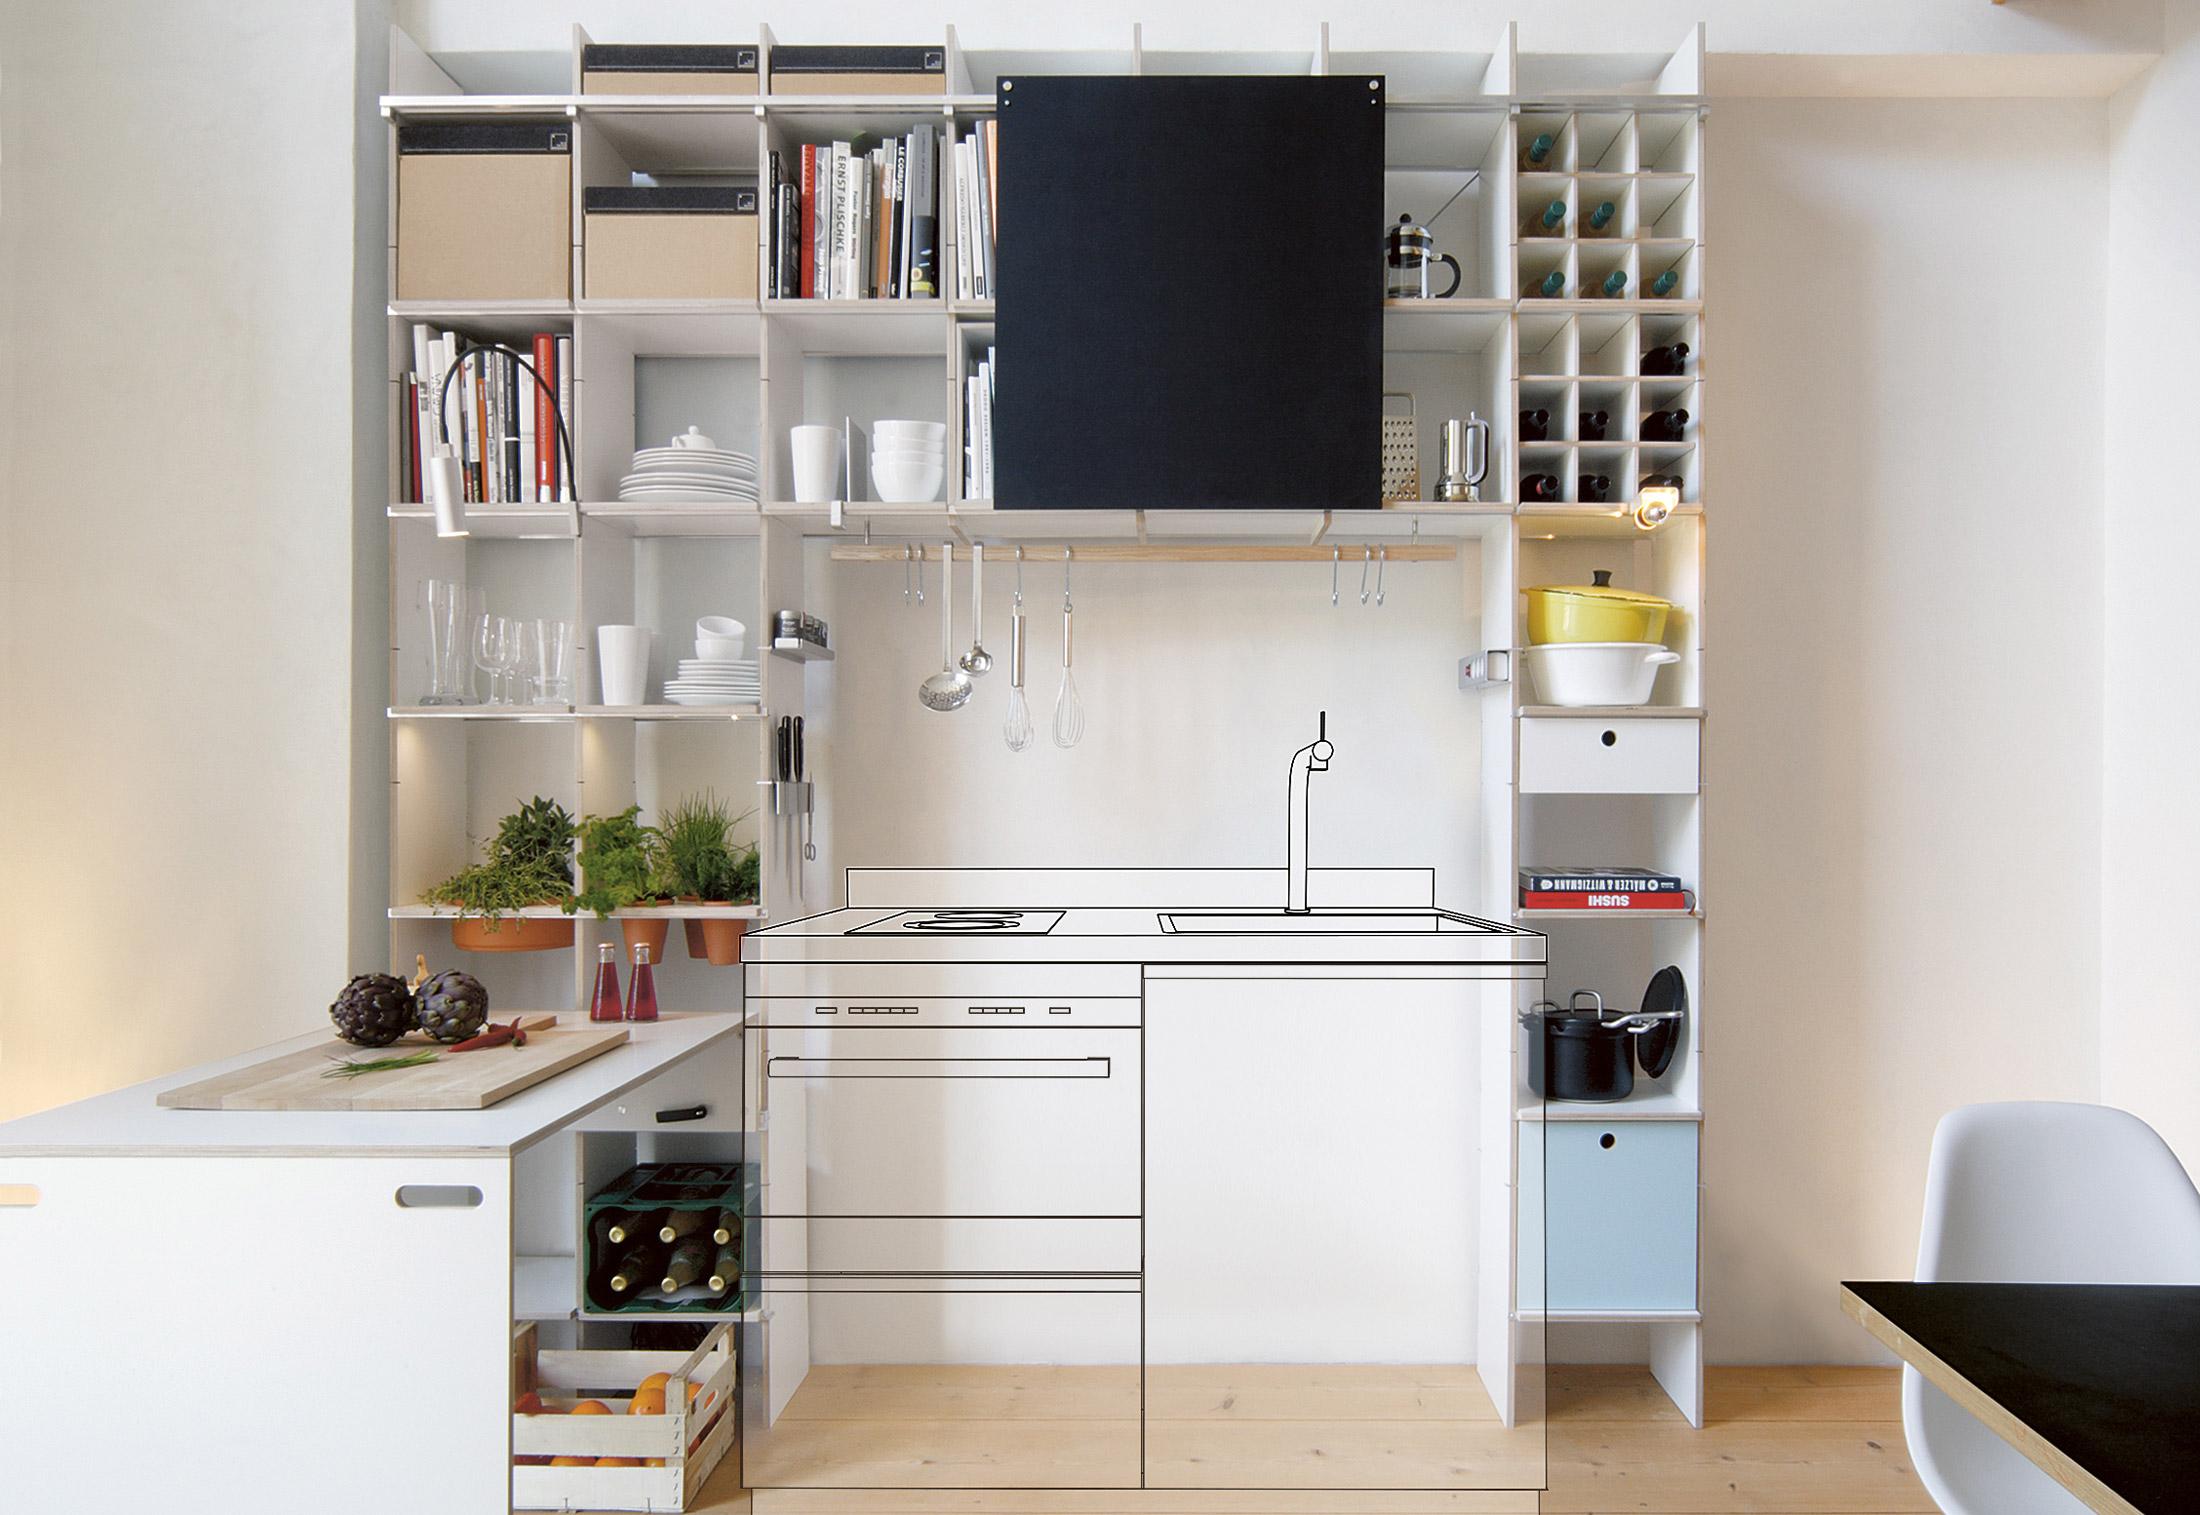 FNP kitchen by Nils Holger Moormann   STYLEPARK